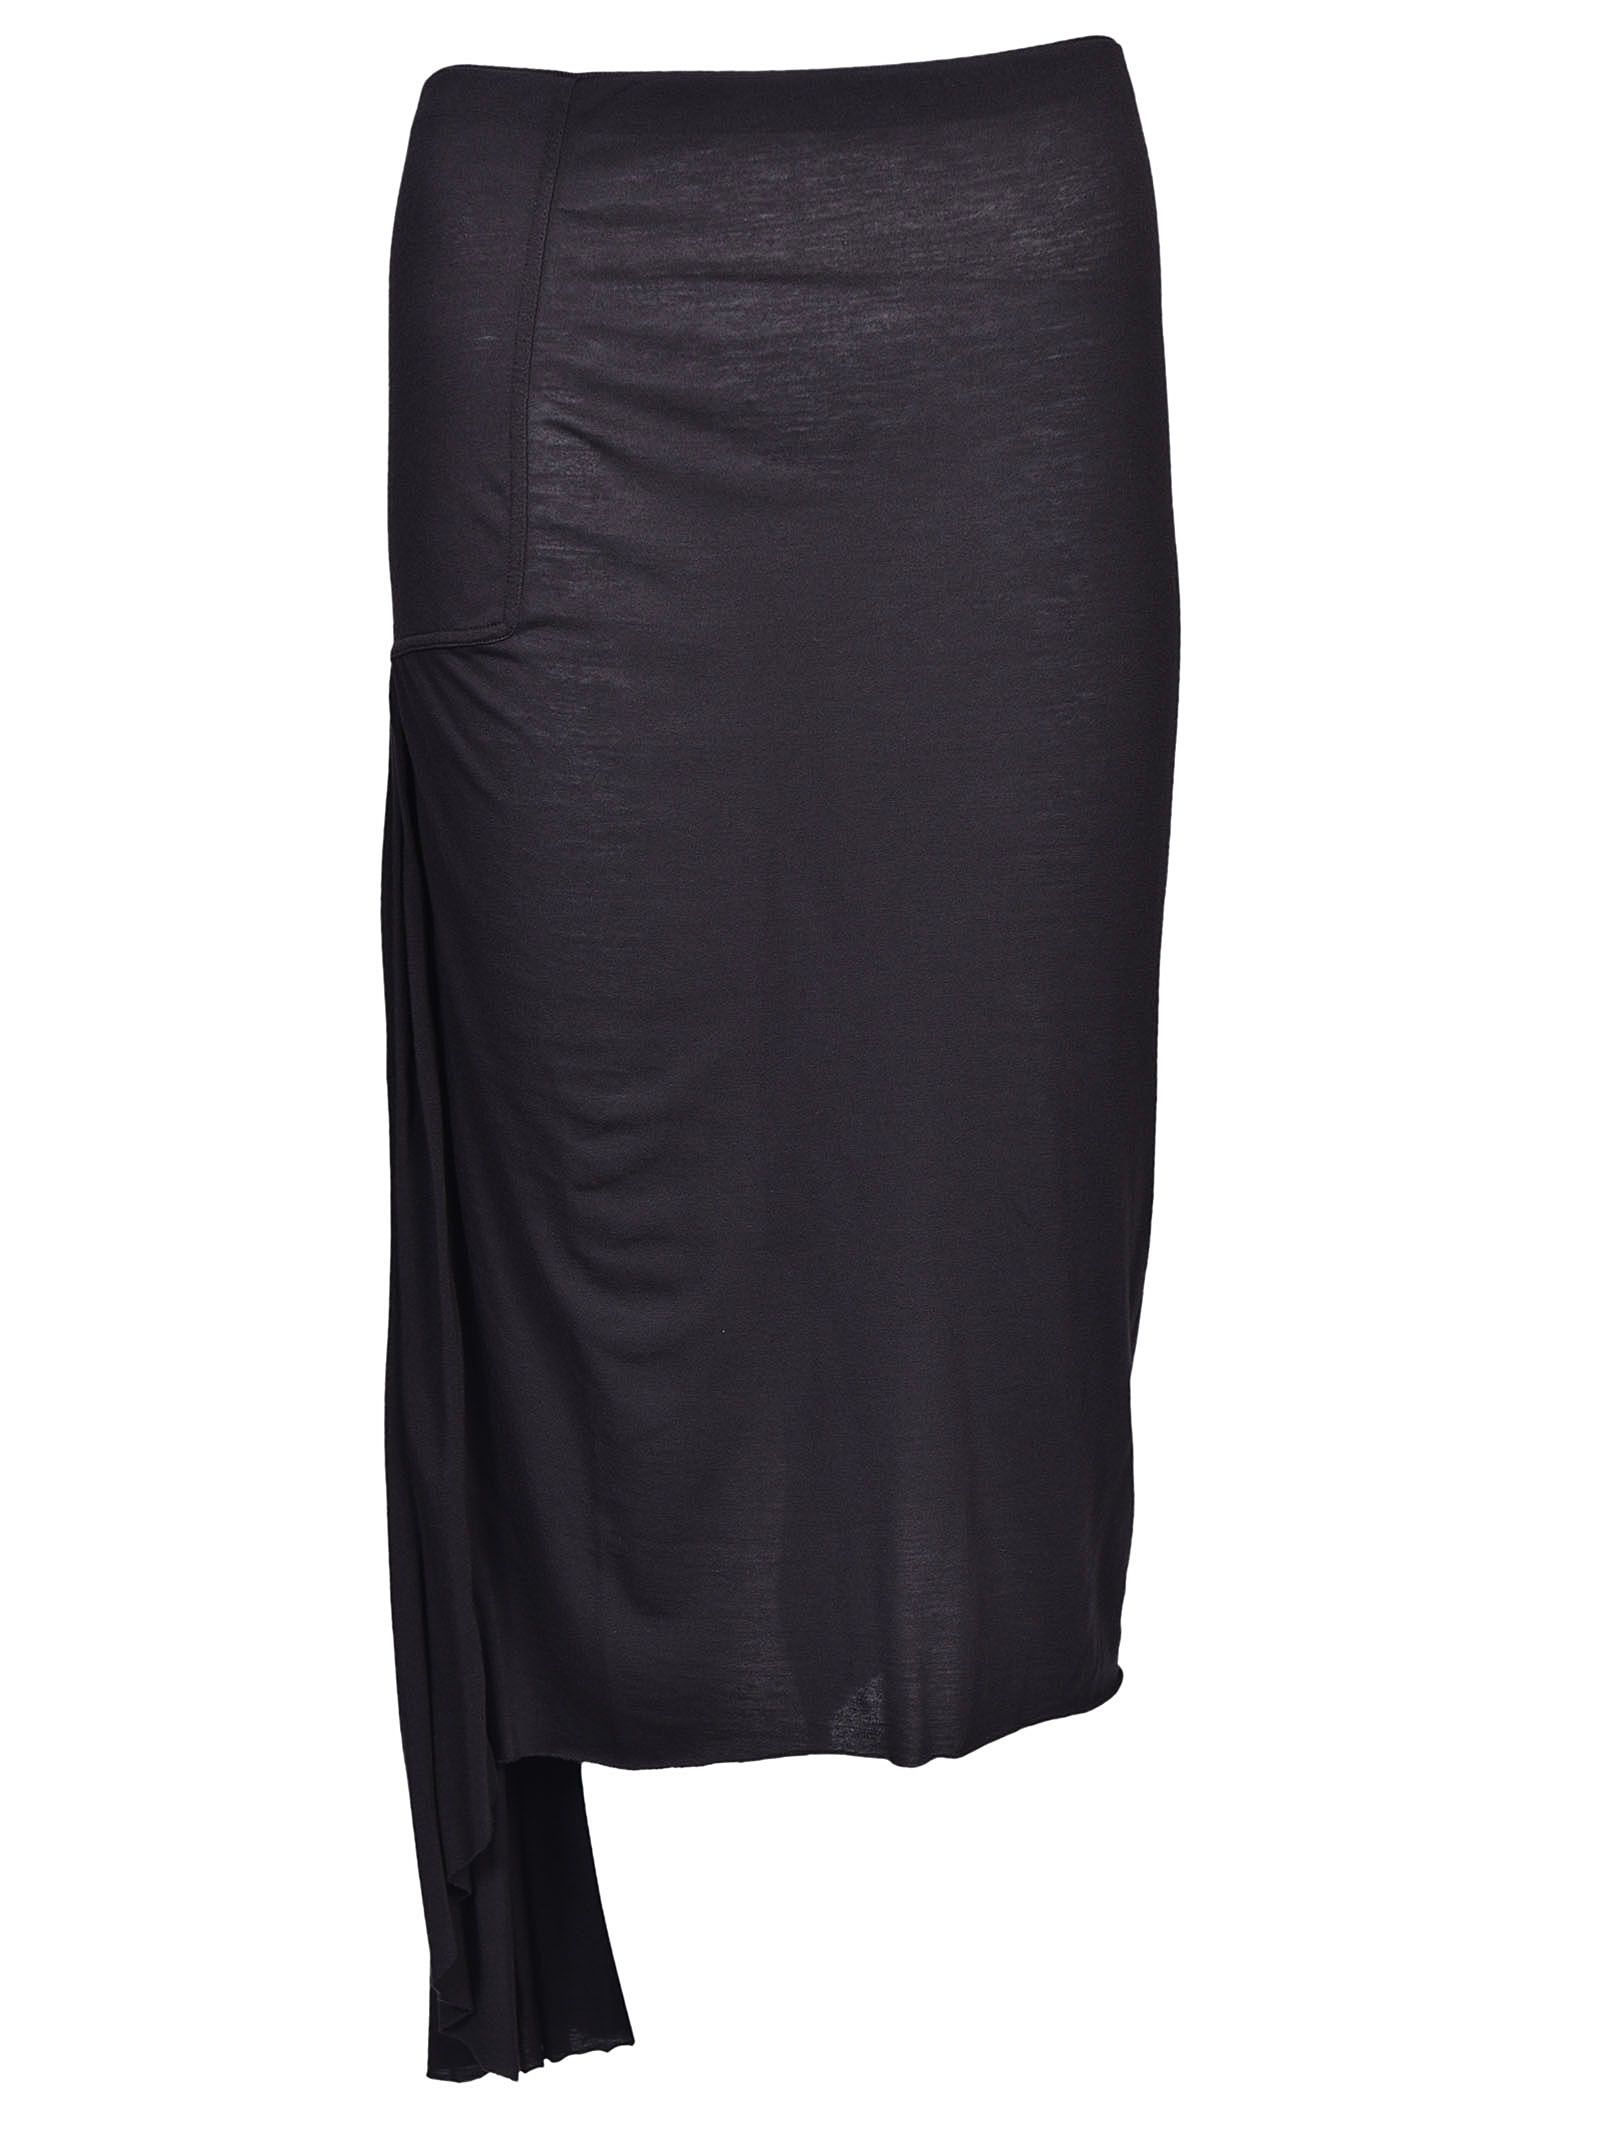 Rick Owens Lilies Asymmetric Skirt